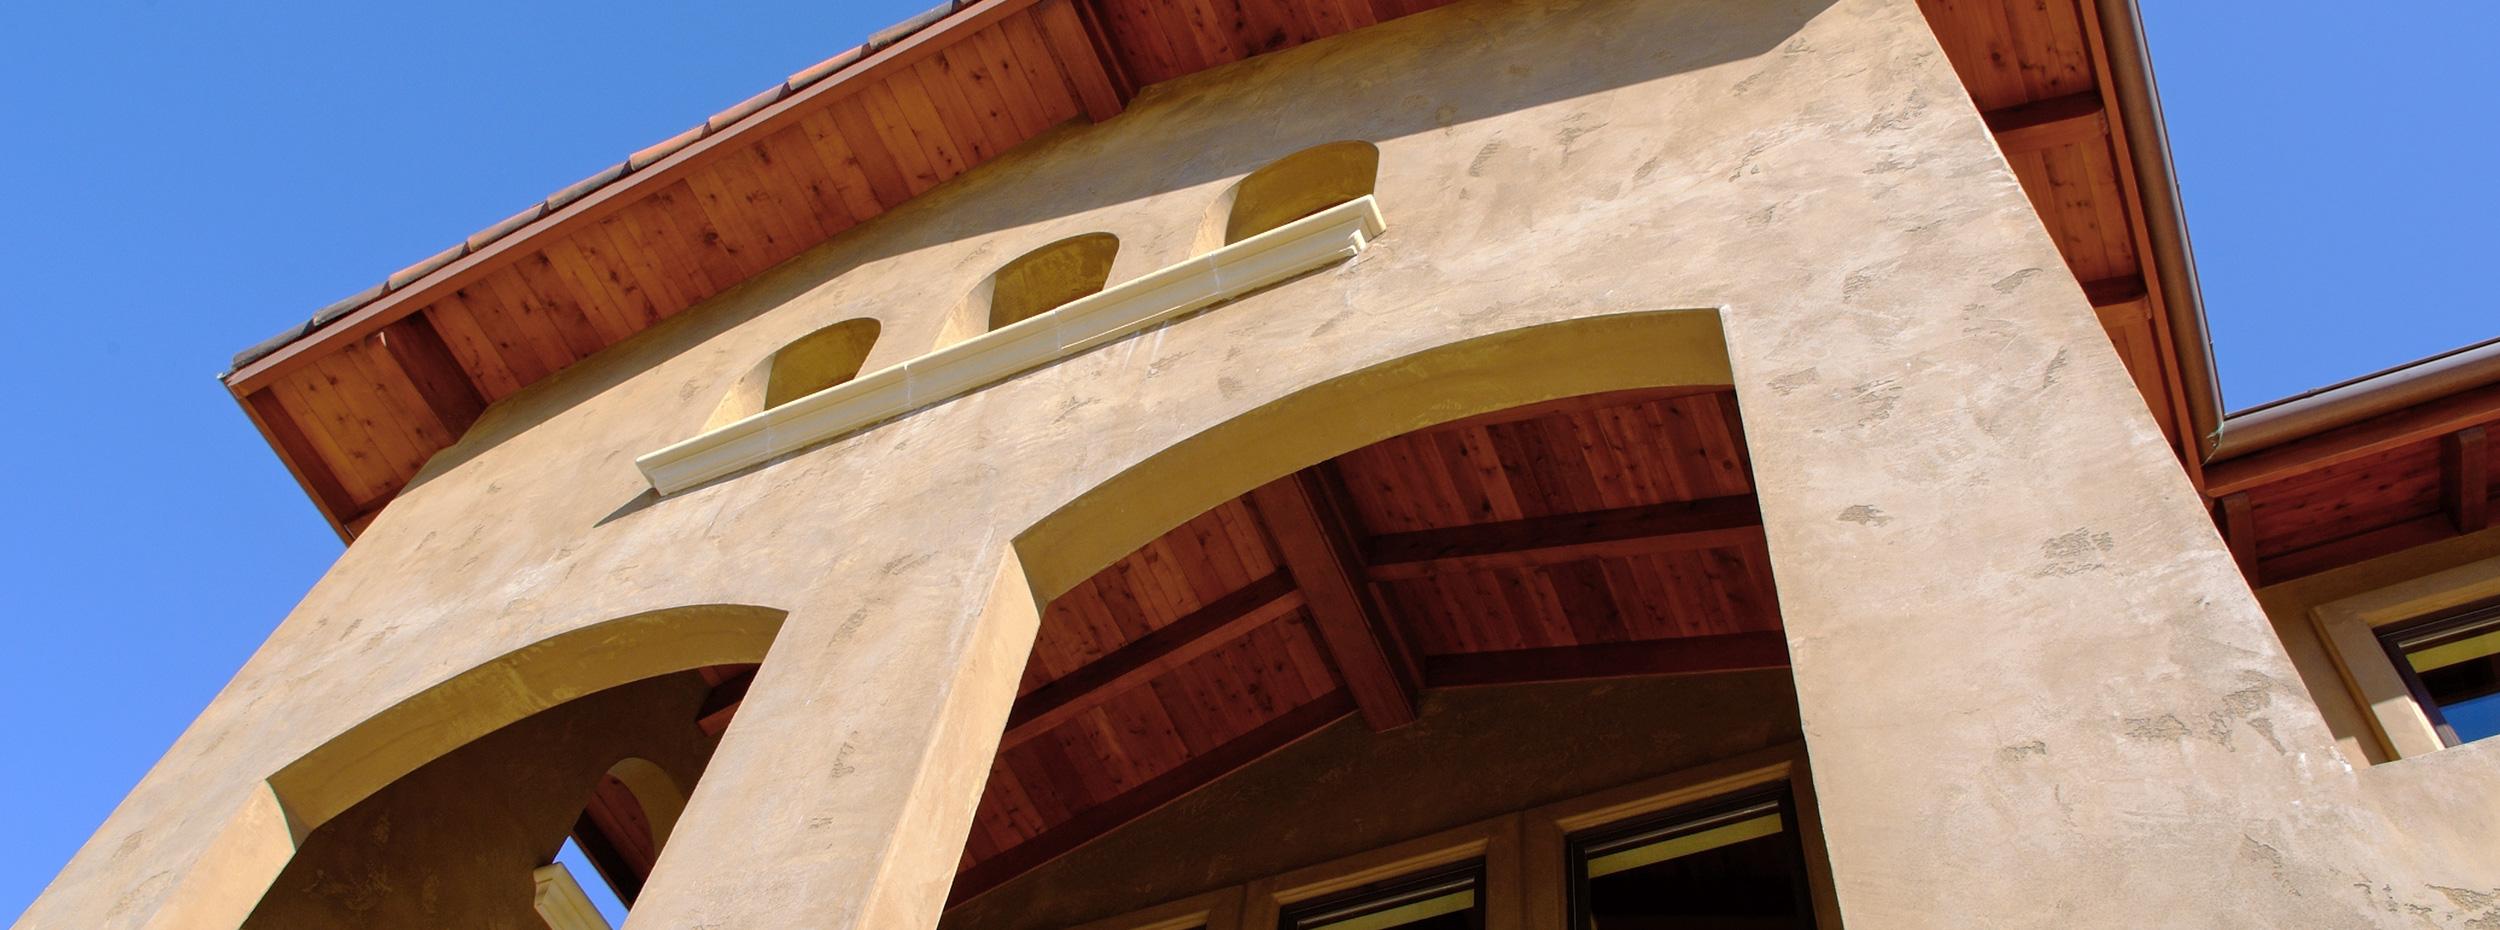 Napa Valley Italian Villa -